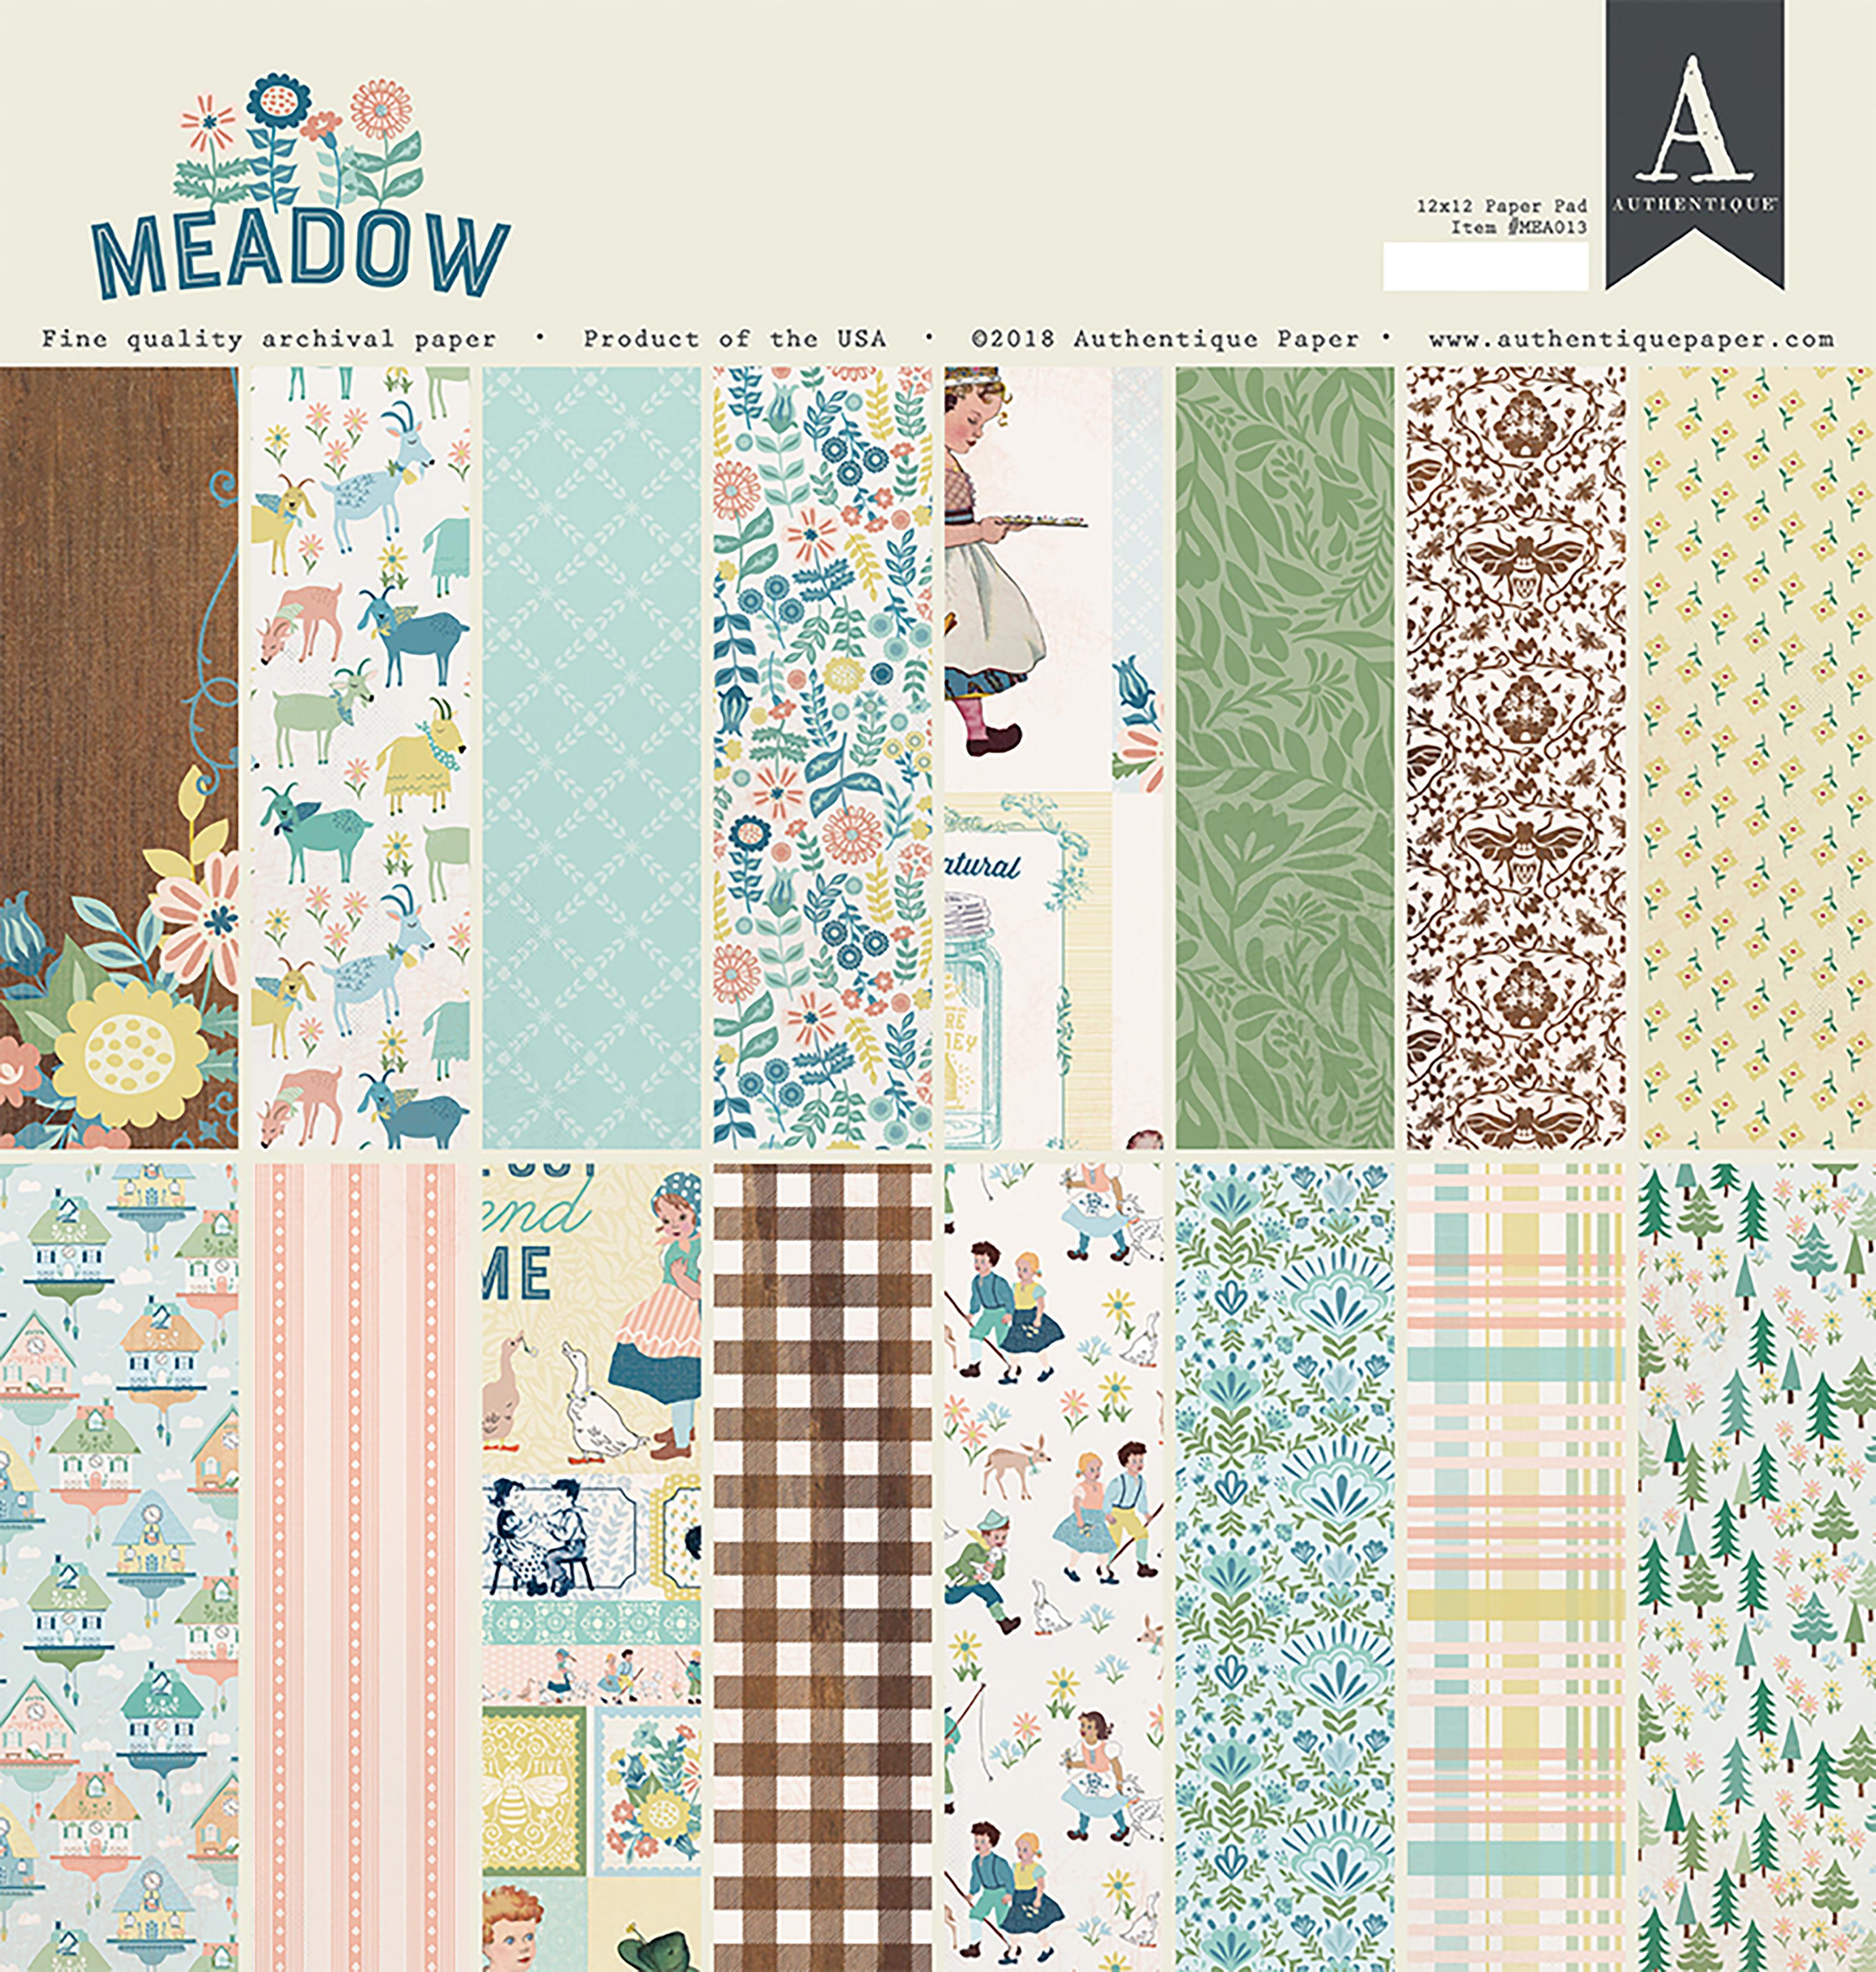 Meadow 12 x 12 Paper Pad